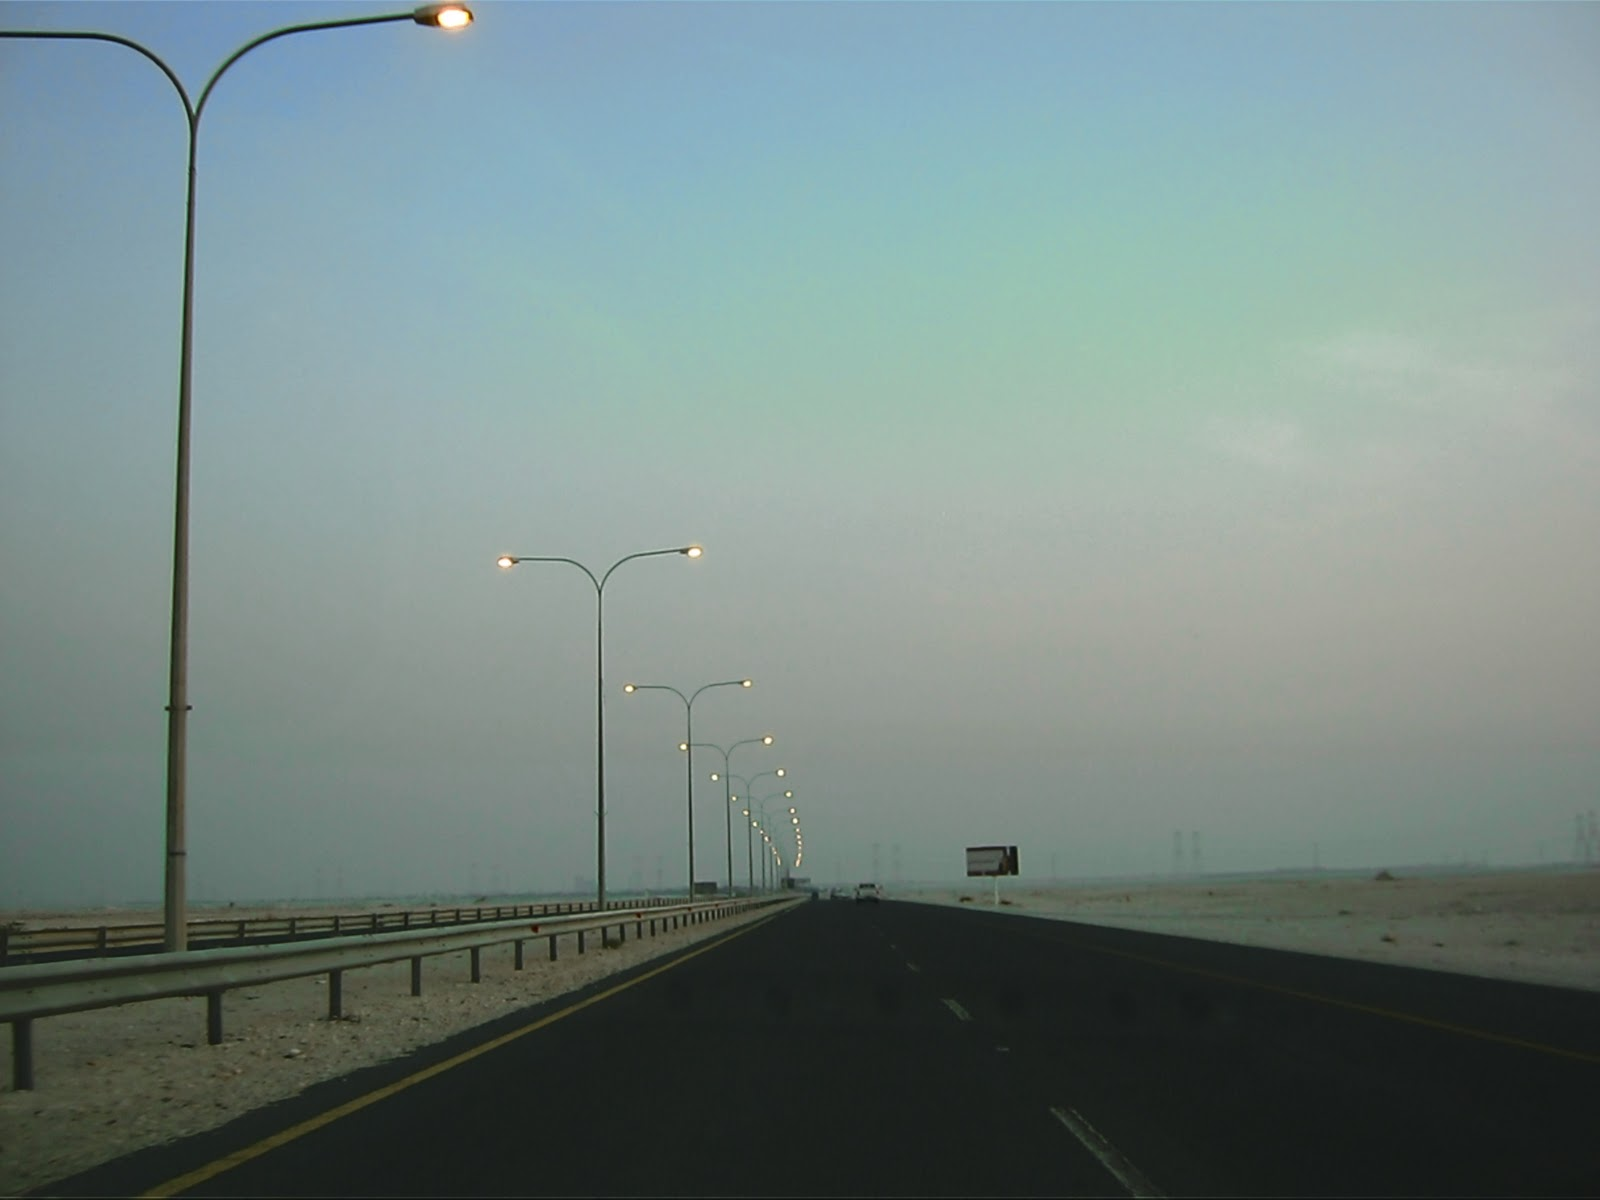 Mesaieed Qatar  city photos : Arjunpuri in Qatar: Mesaieed Beach in Qatar